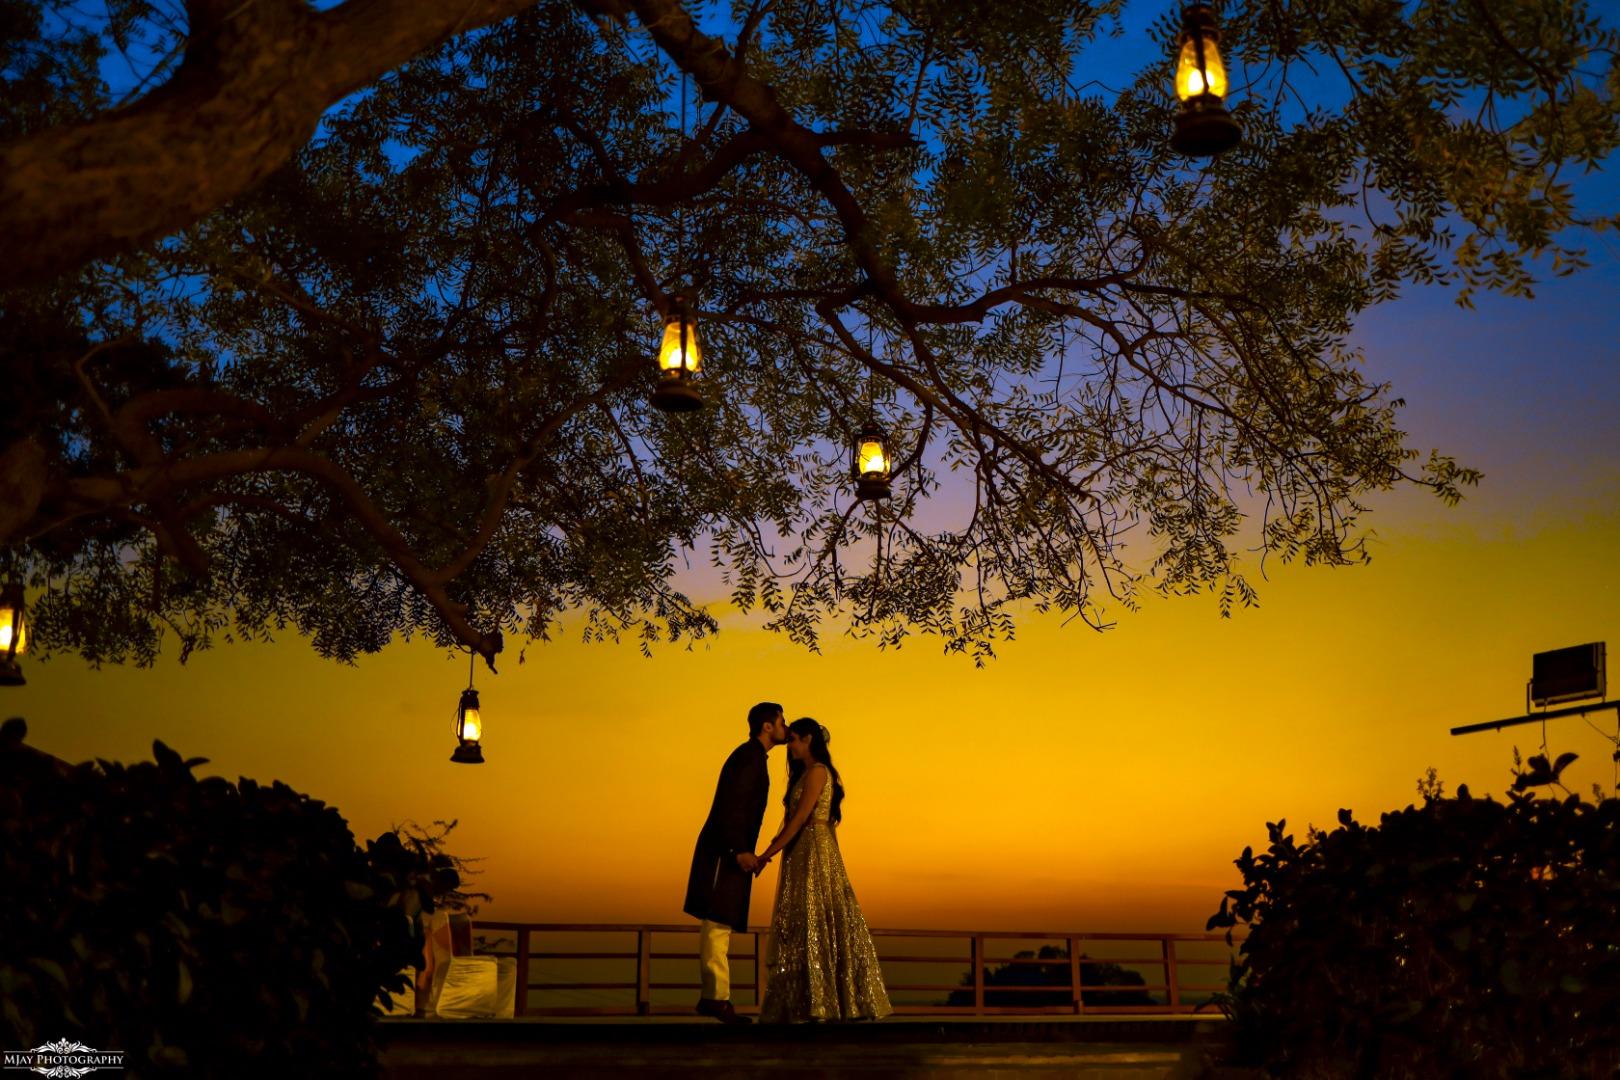 Evening Couple Pre Wedding Photoshoot with Lanterns